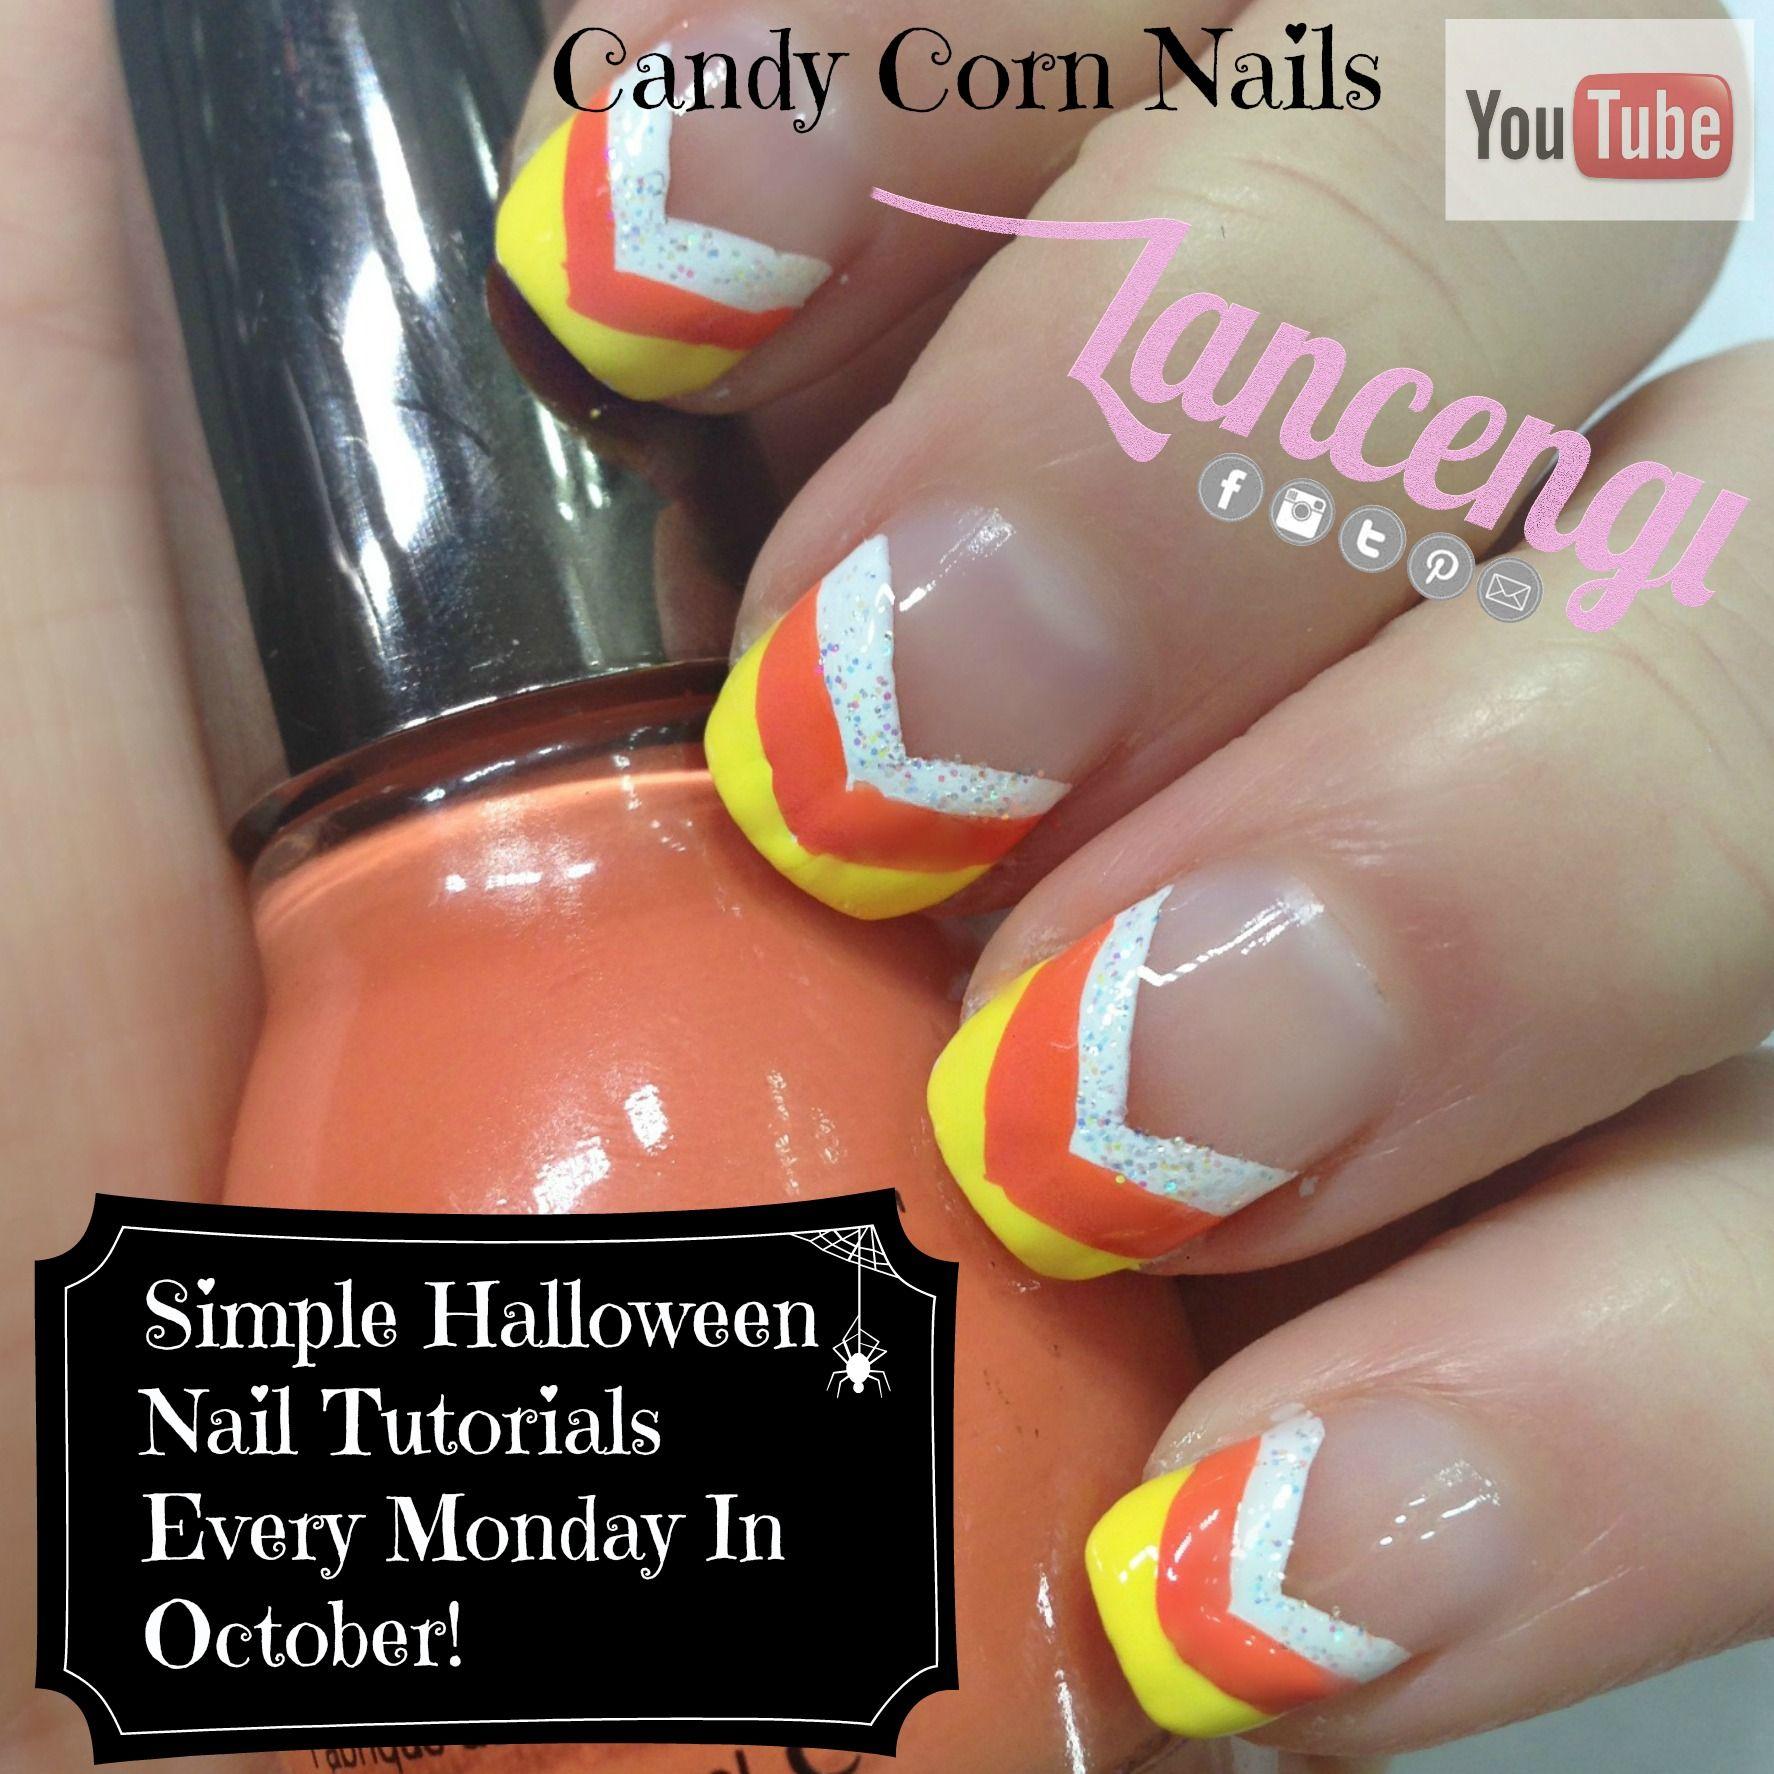 Easy Halloween Nail Art Designs Candy Corn Nails 2014 Lancengi